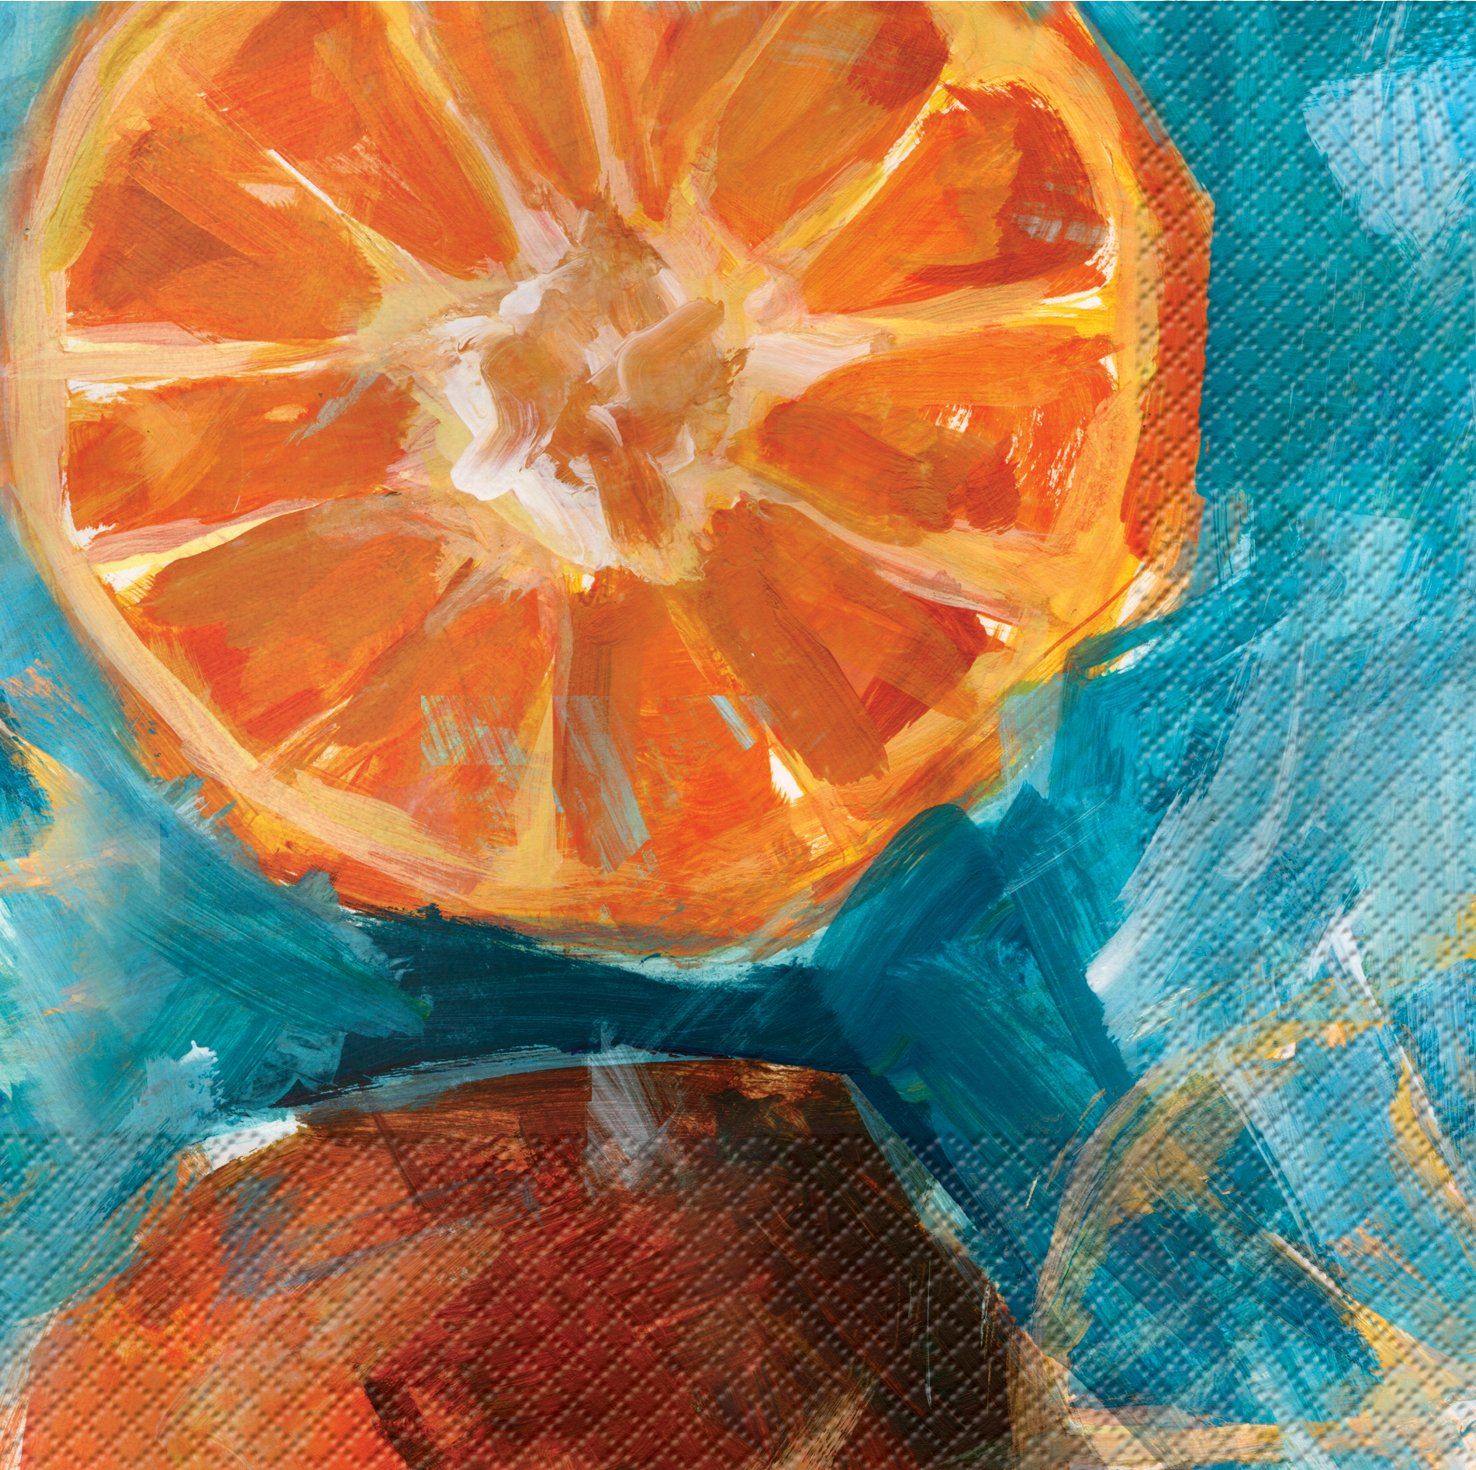 Orange 659360 Fruit Expressions Creative Converting 24 Count Elise Premium Patterned Beverage Napkins